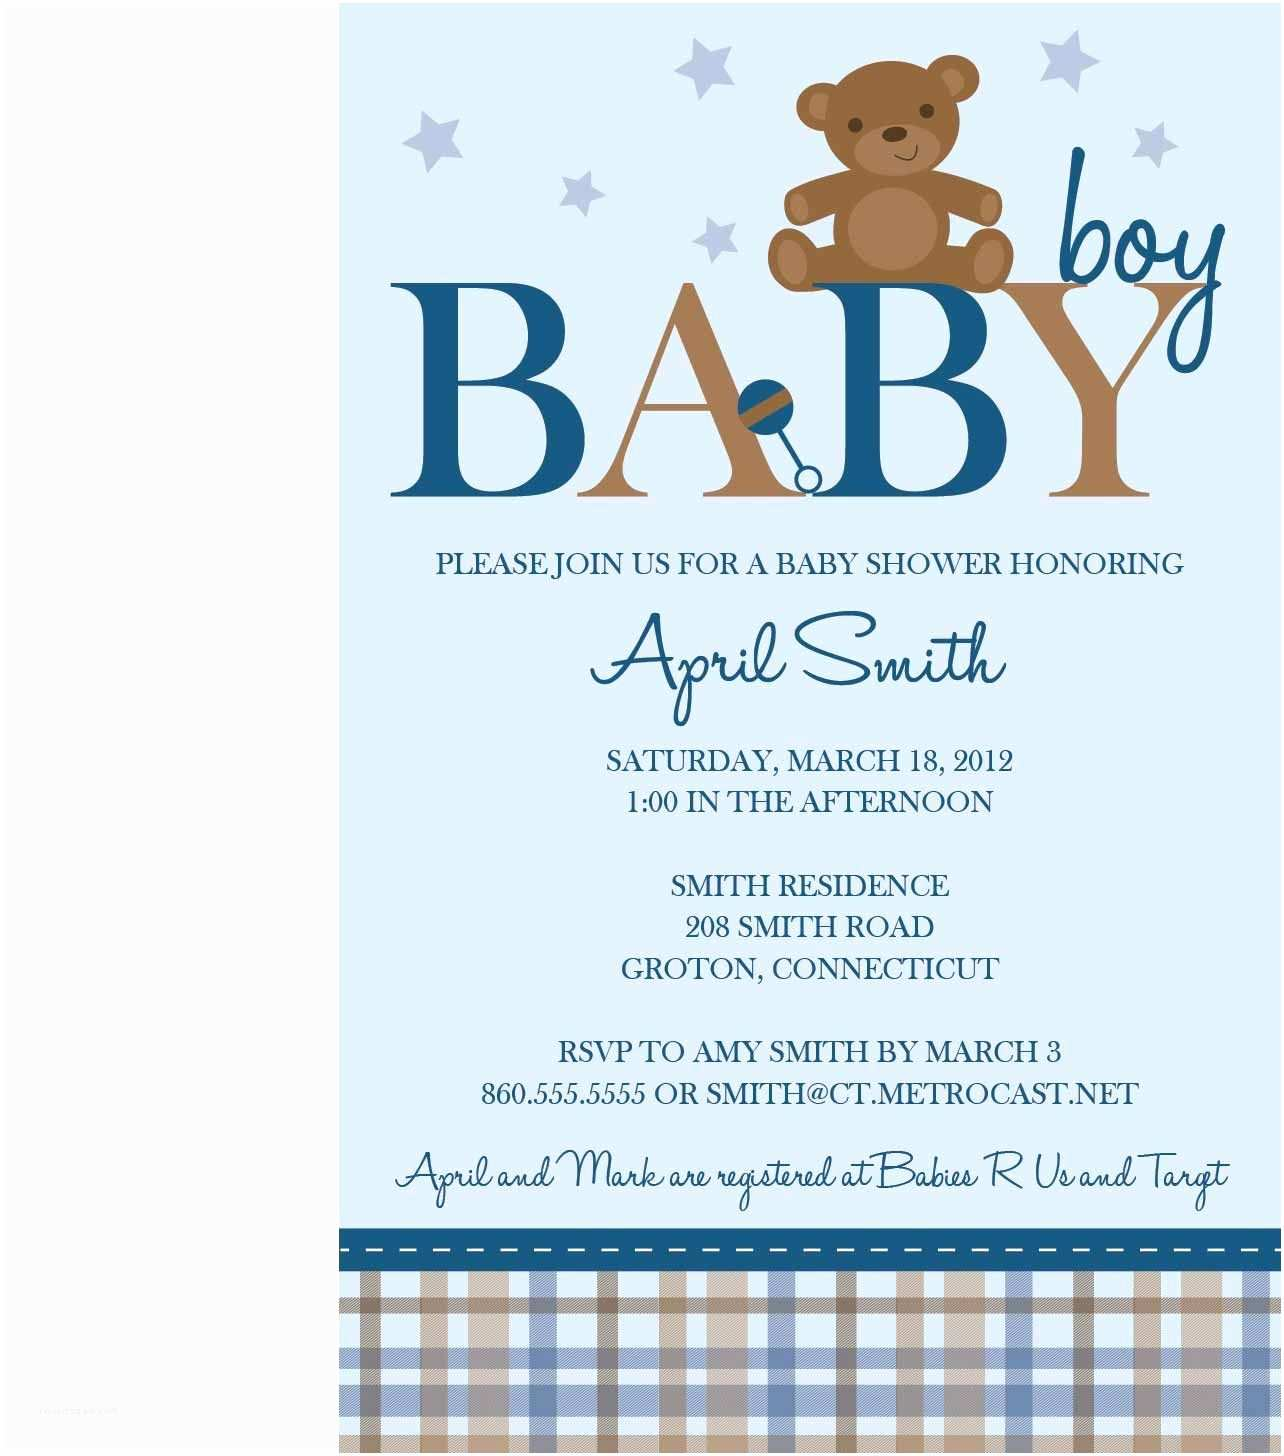 Baby Shower Invitations Ideas for Boys Teddy Bear Baby Shower Templates